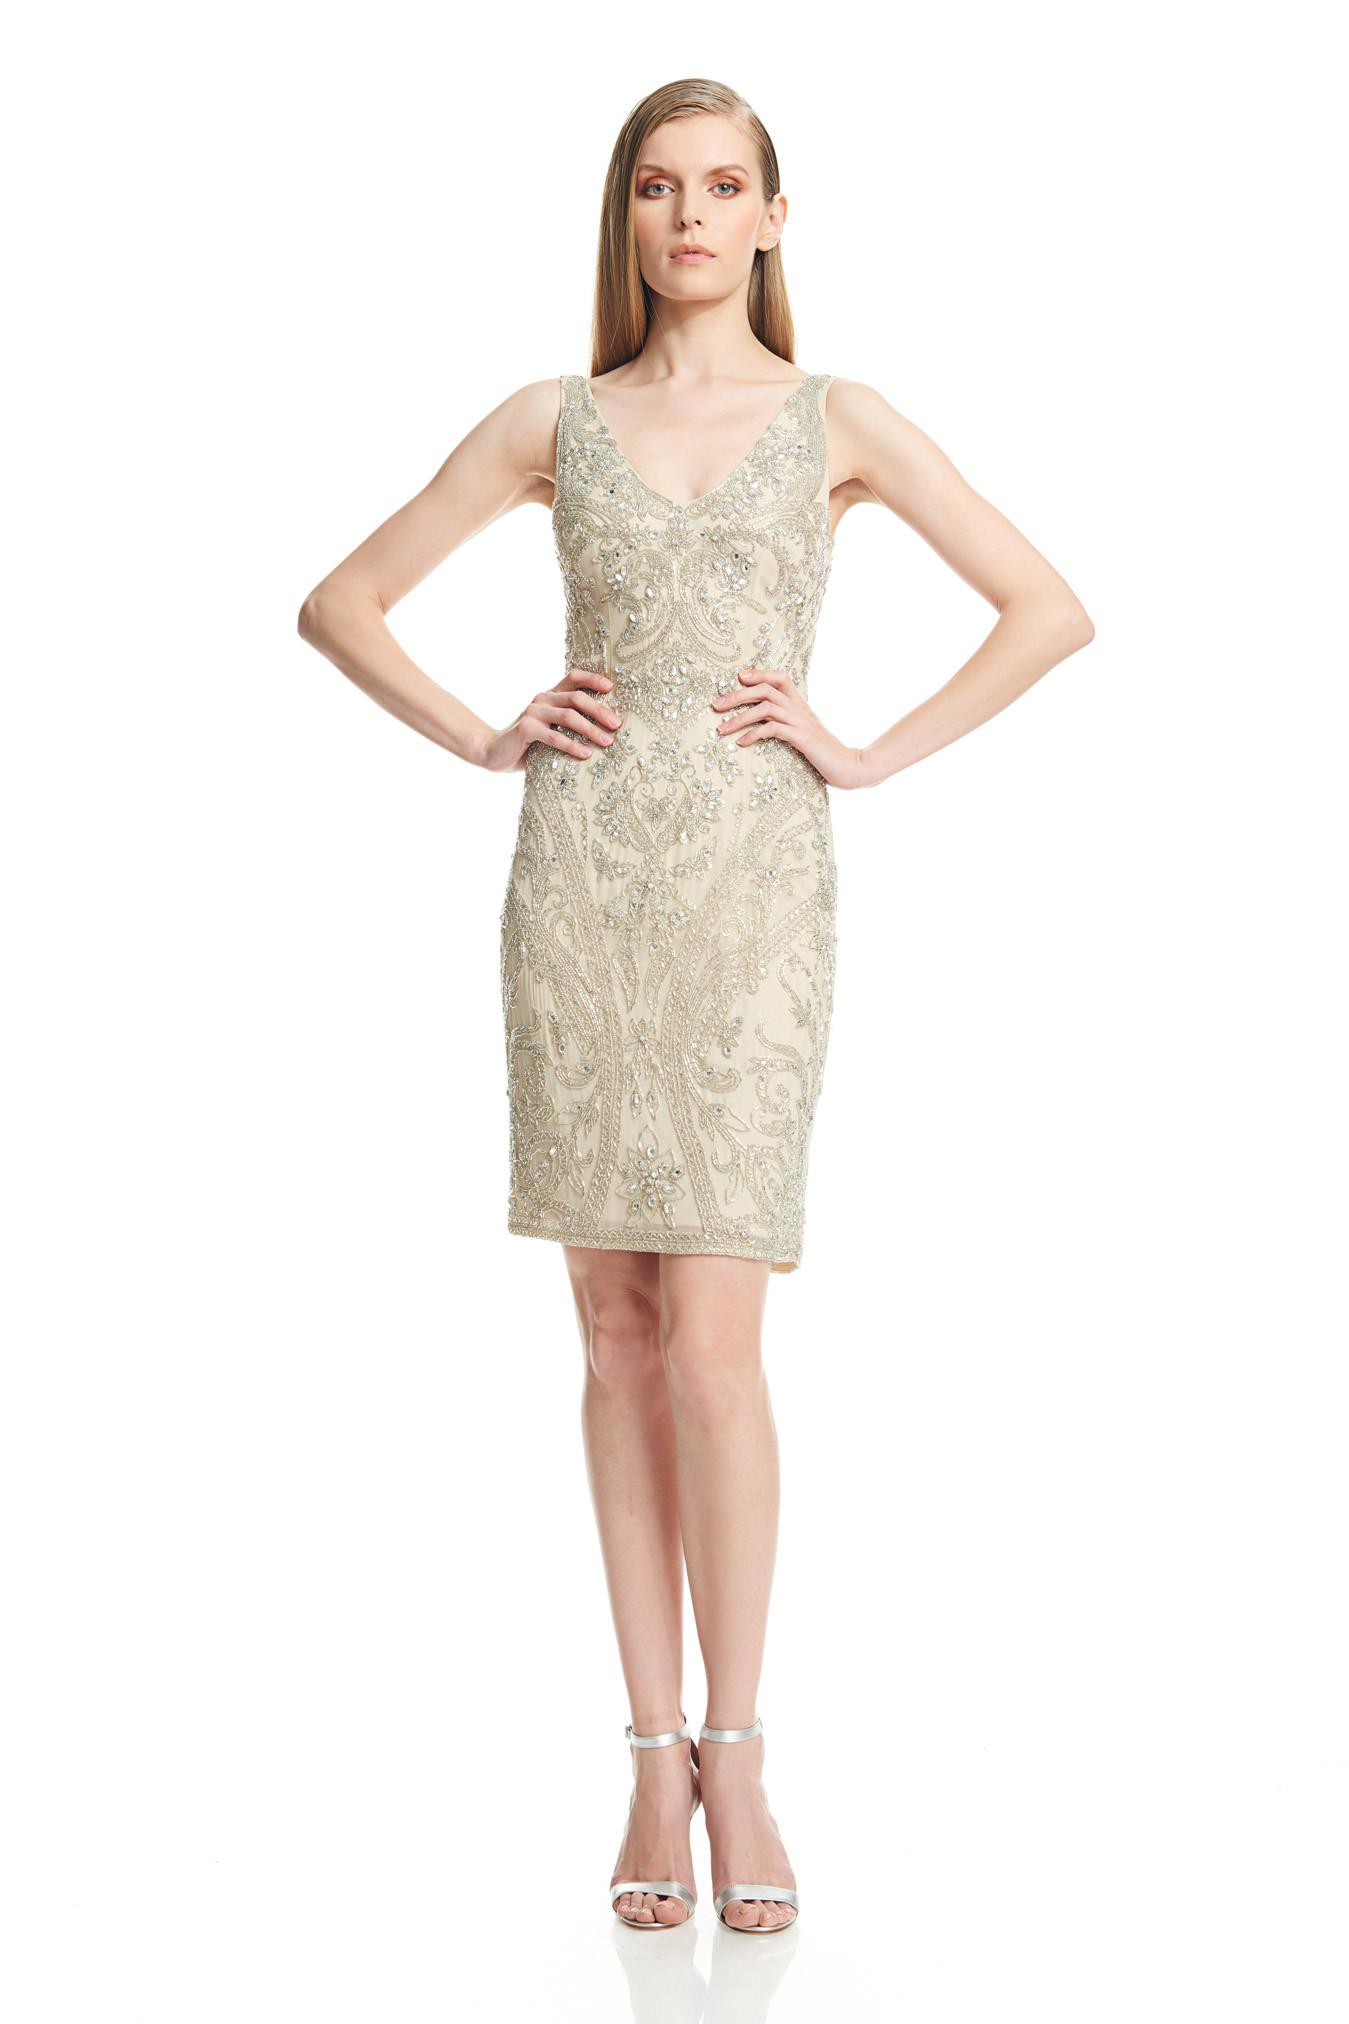 LuxurySoi | Shop Exclusive Designer Luxury High Fashion Clothing ...